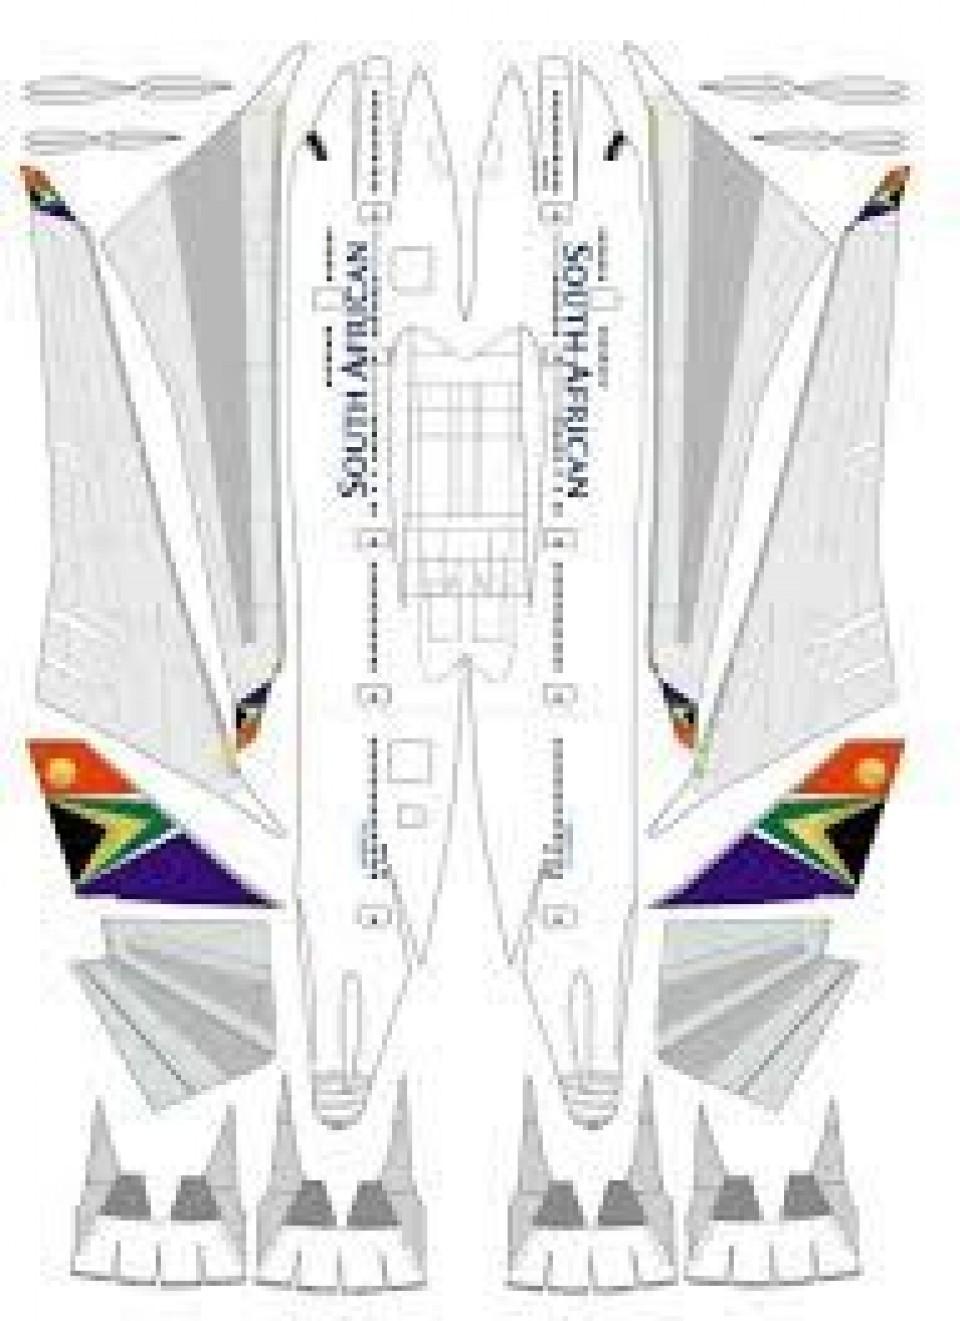 005 Fearsome Printable Paper Plane Plan Photo  Free Airplane Template Pdf960